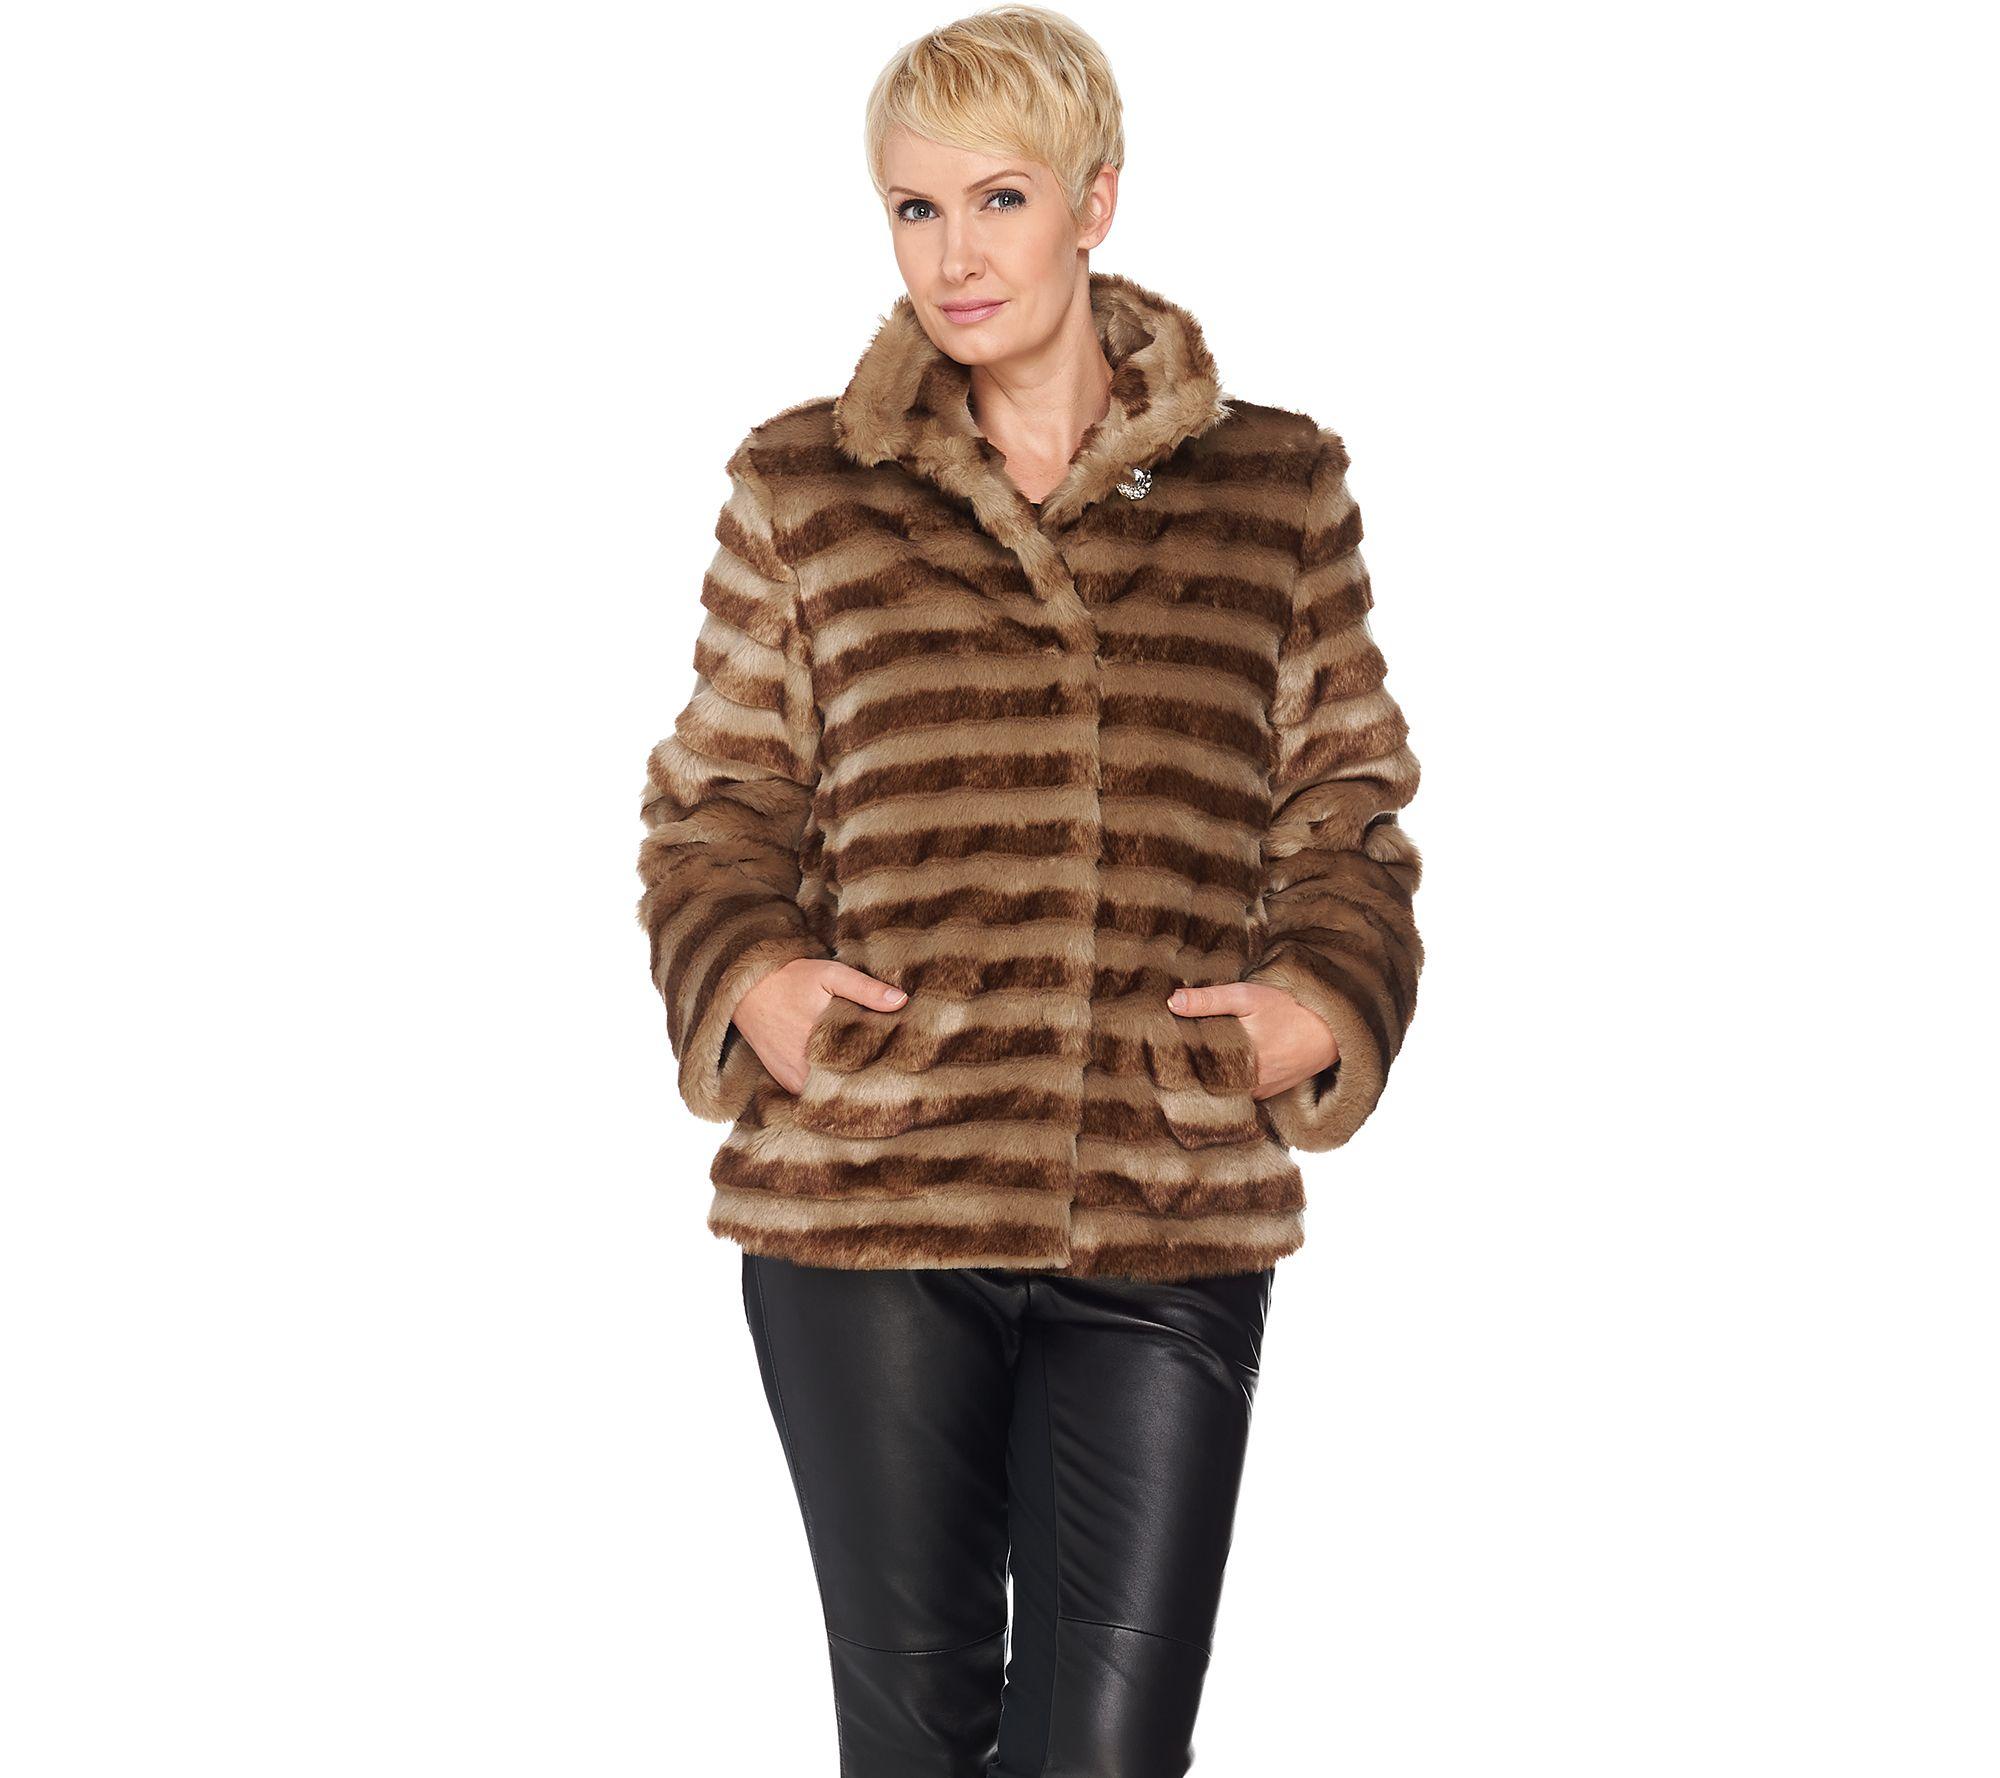 Dennis Basso Dennis Basso Platinum Collection Faux Fur Cropped Jacket Page 1